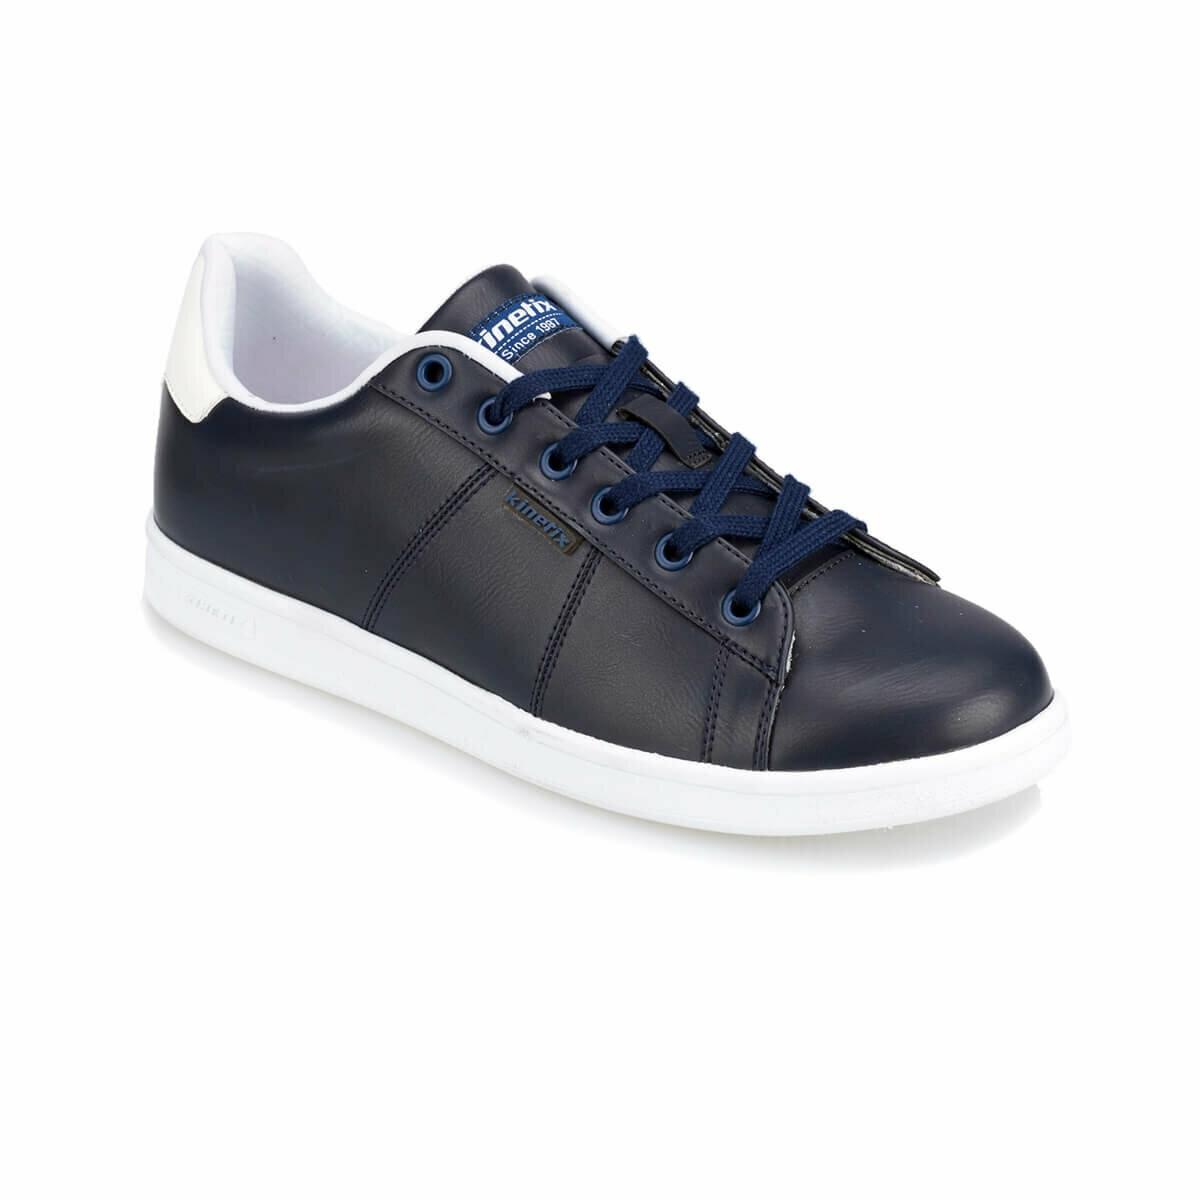 FLO COLOMBO Navy Blue Men 'S Shoes KINETIX